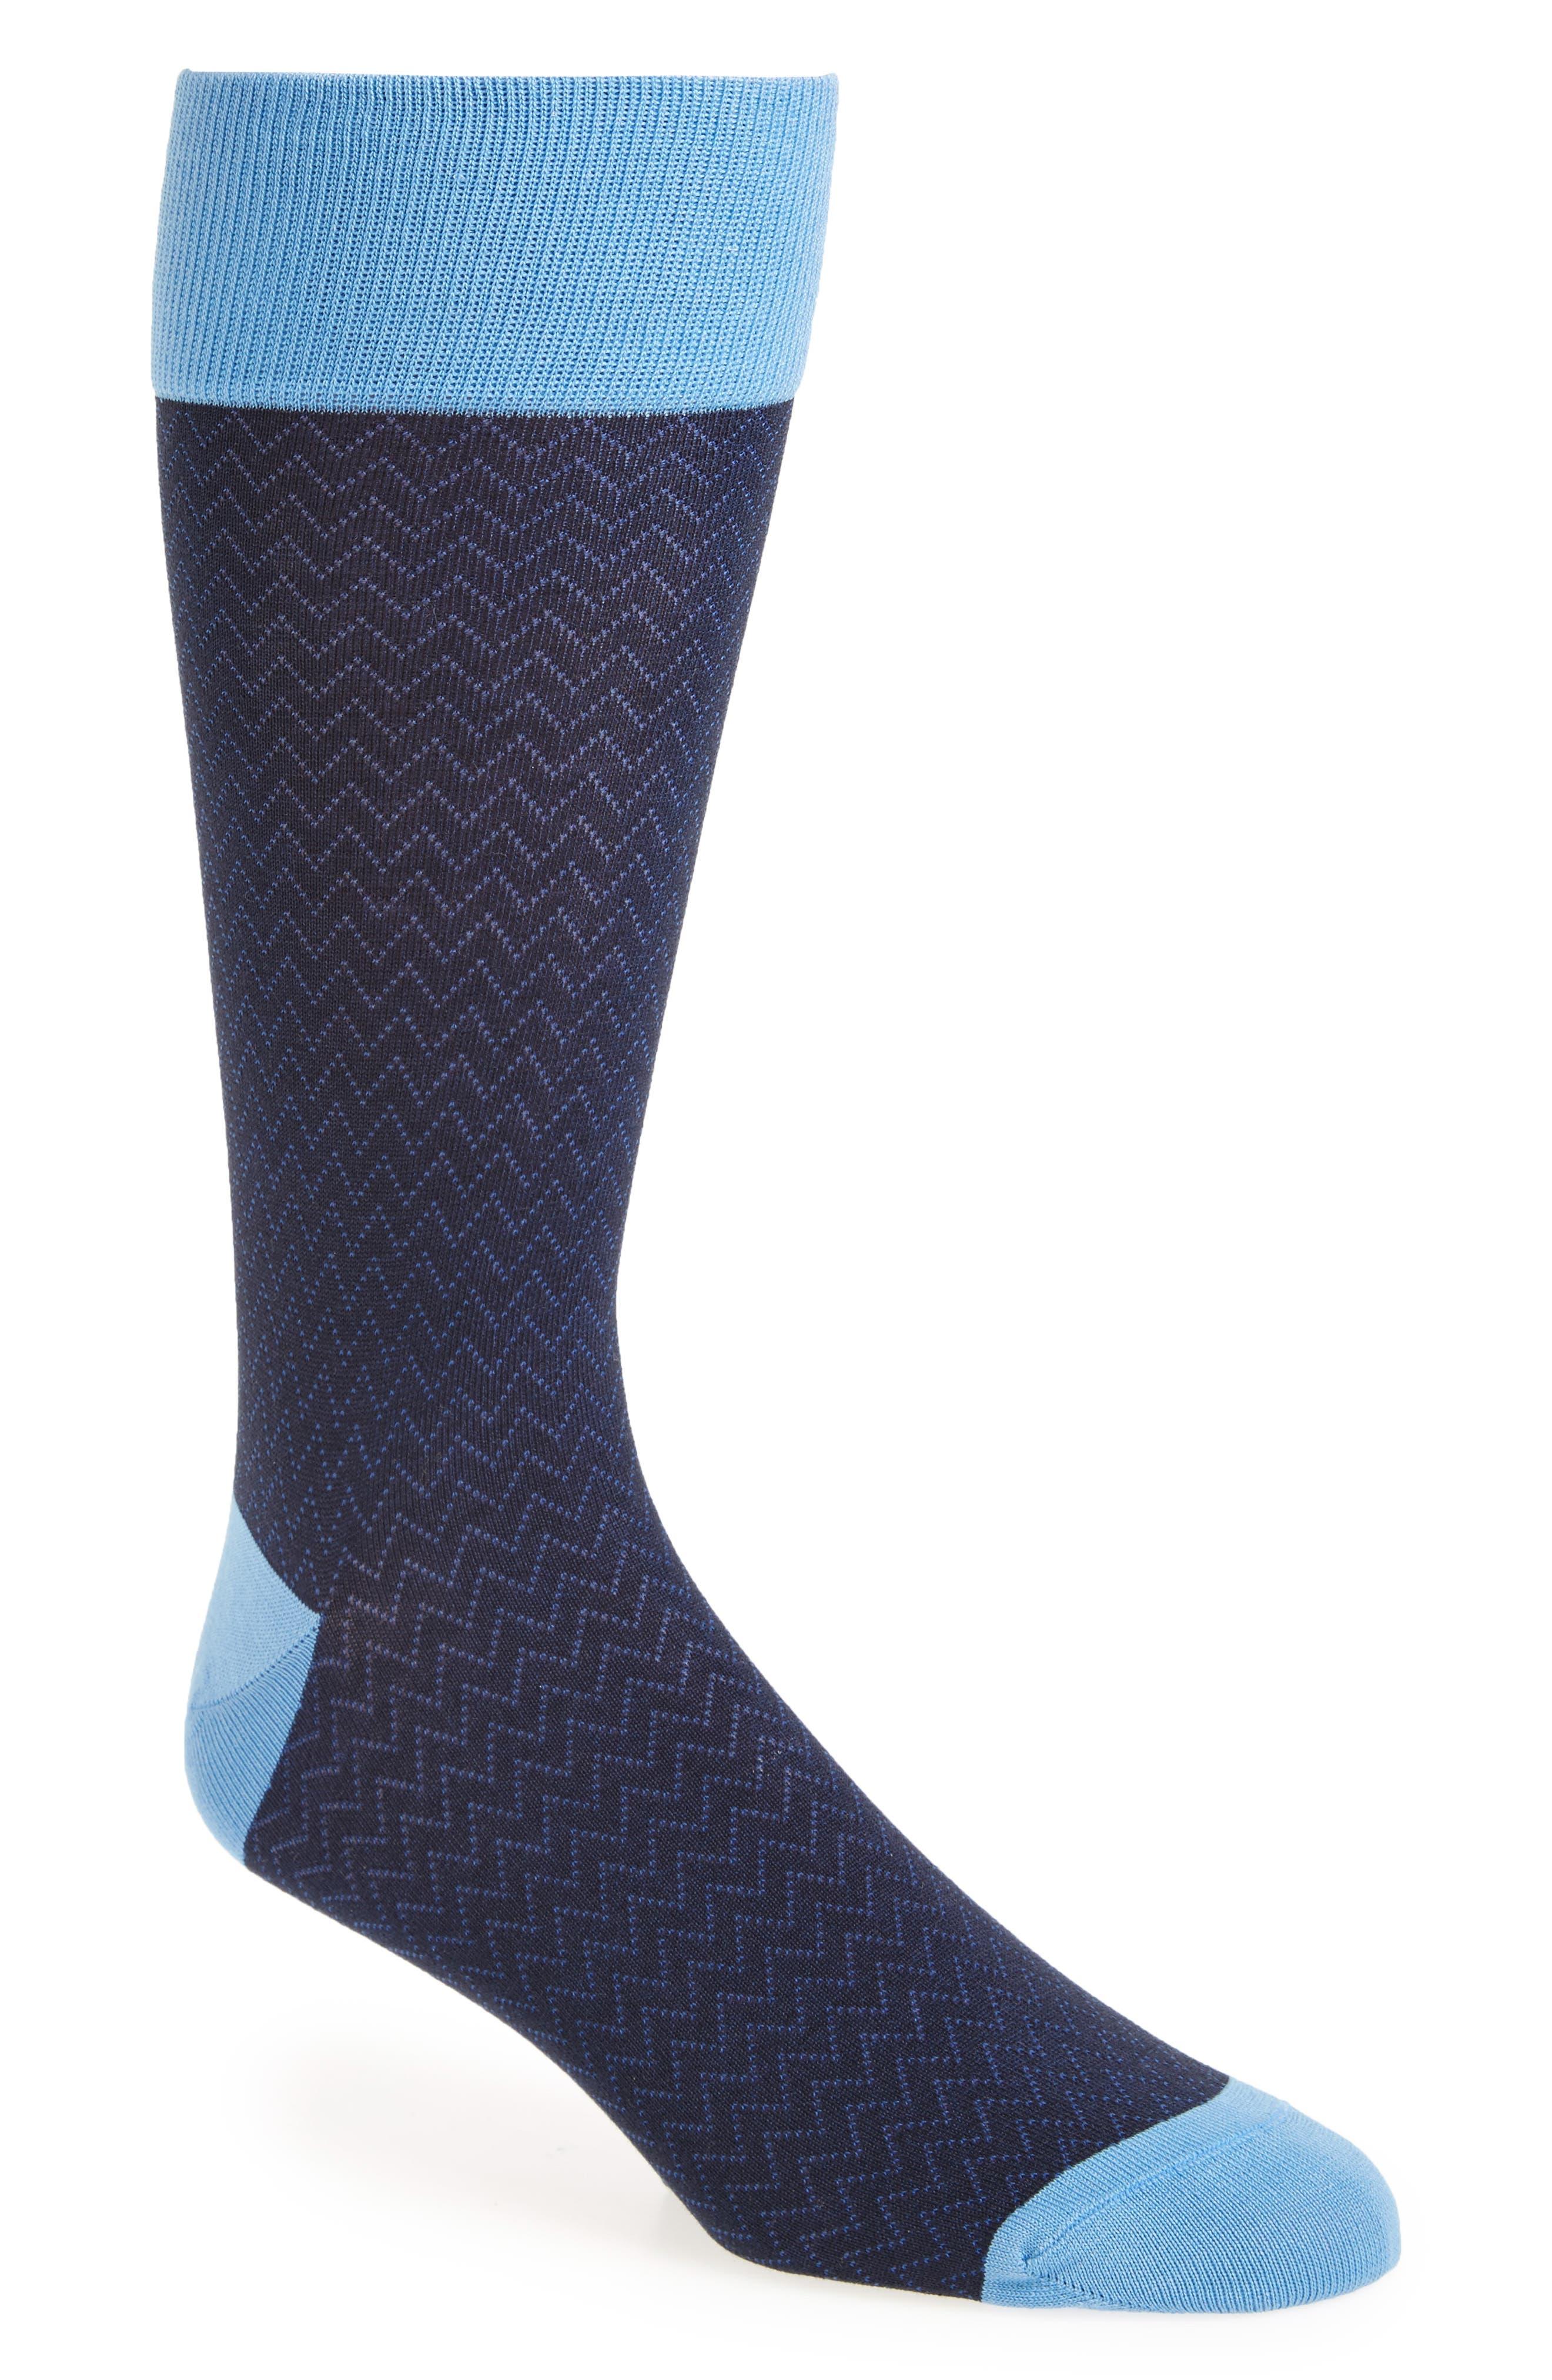 Mercerized Herringbone Socks,                             Main thumbnail 1, color,                             410